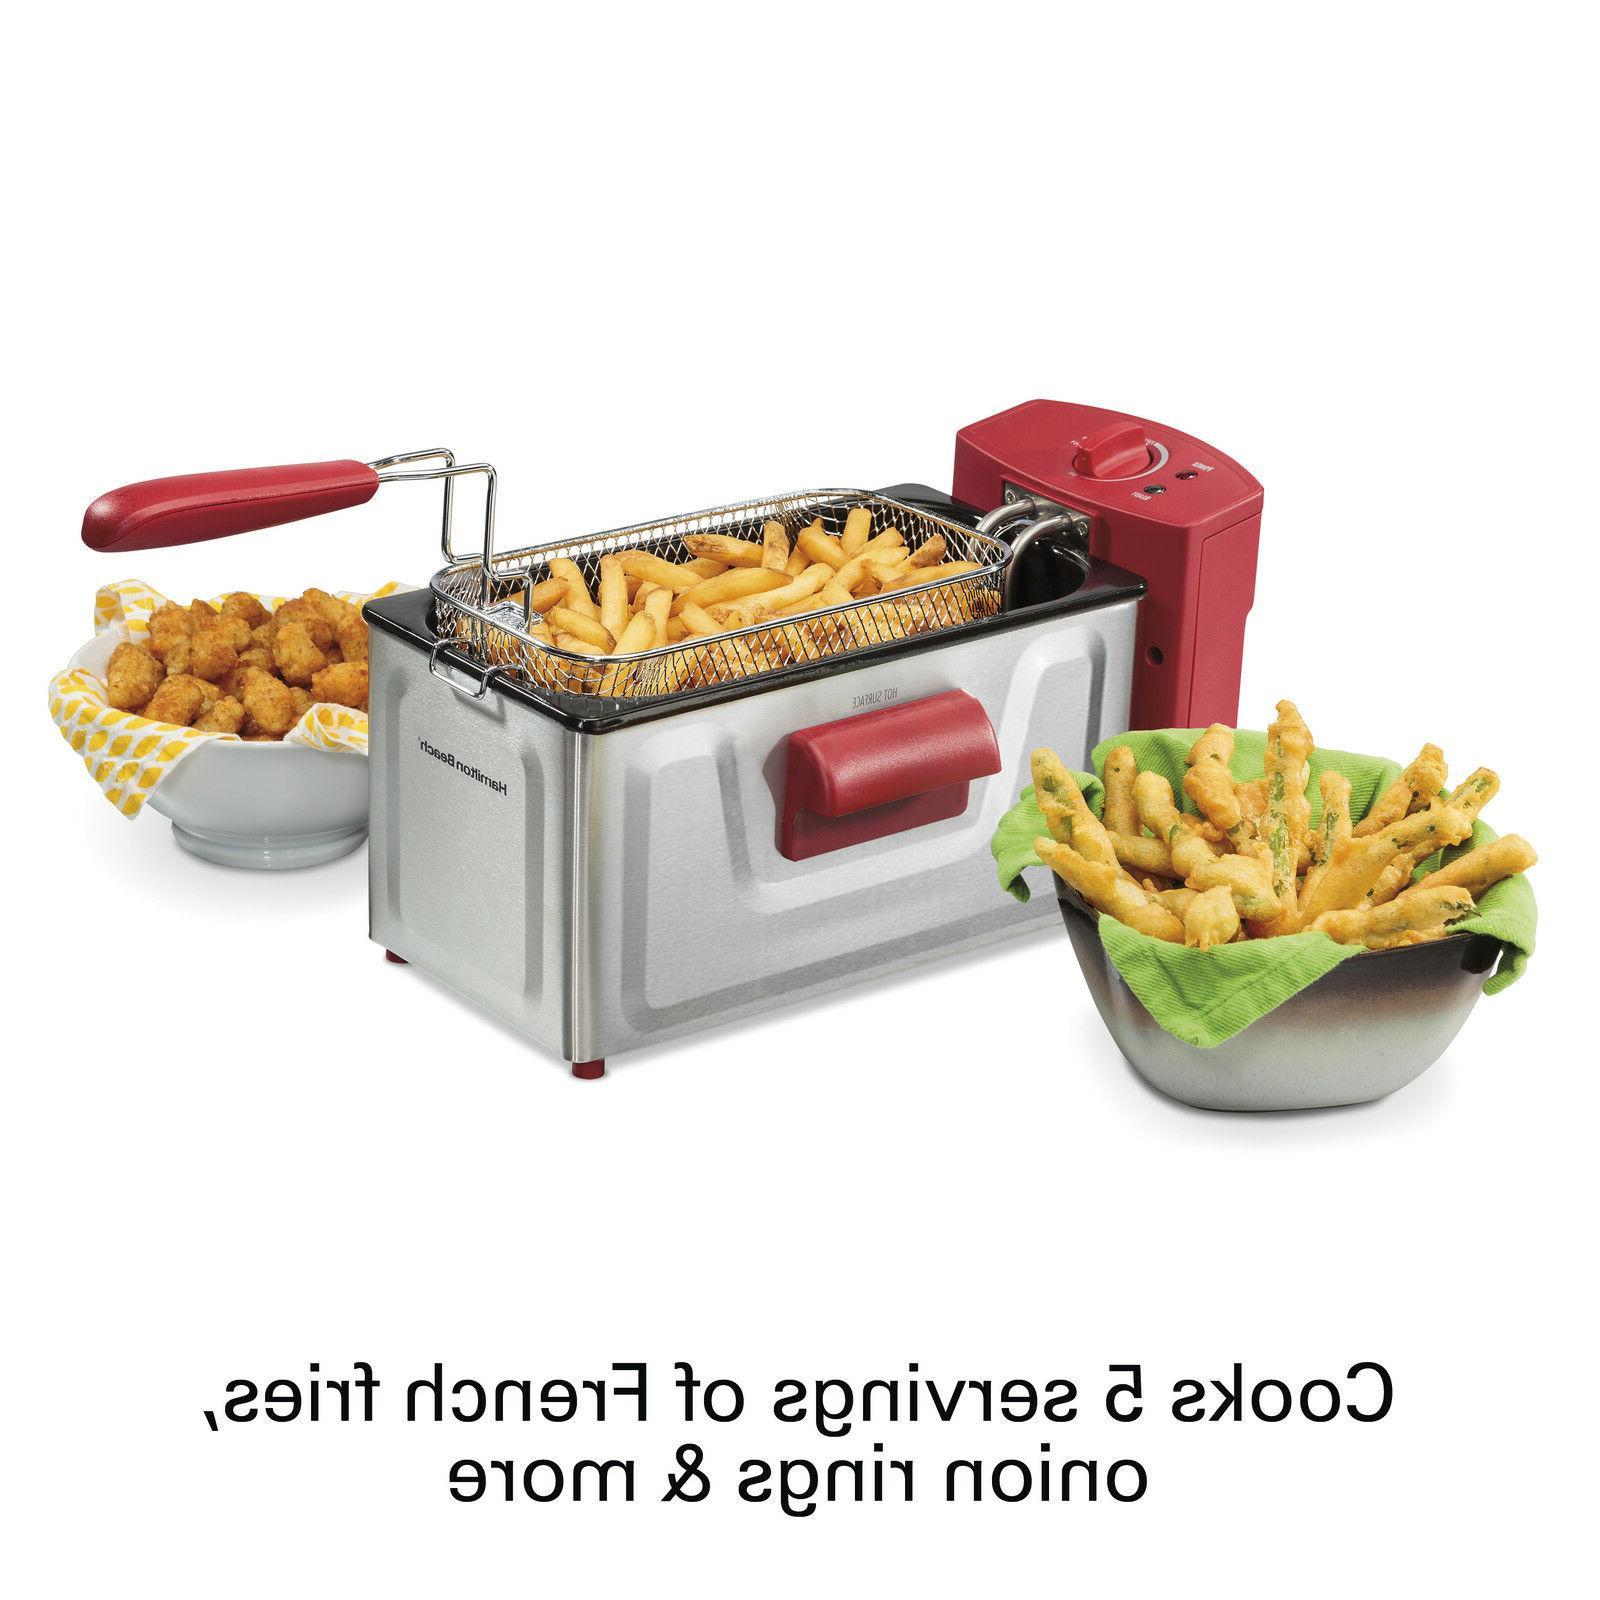 2 Fryer Basket Cooker Countertop Stainless